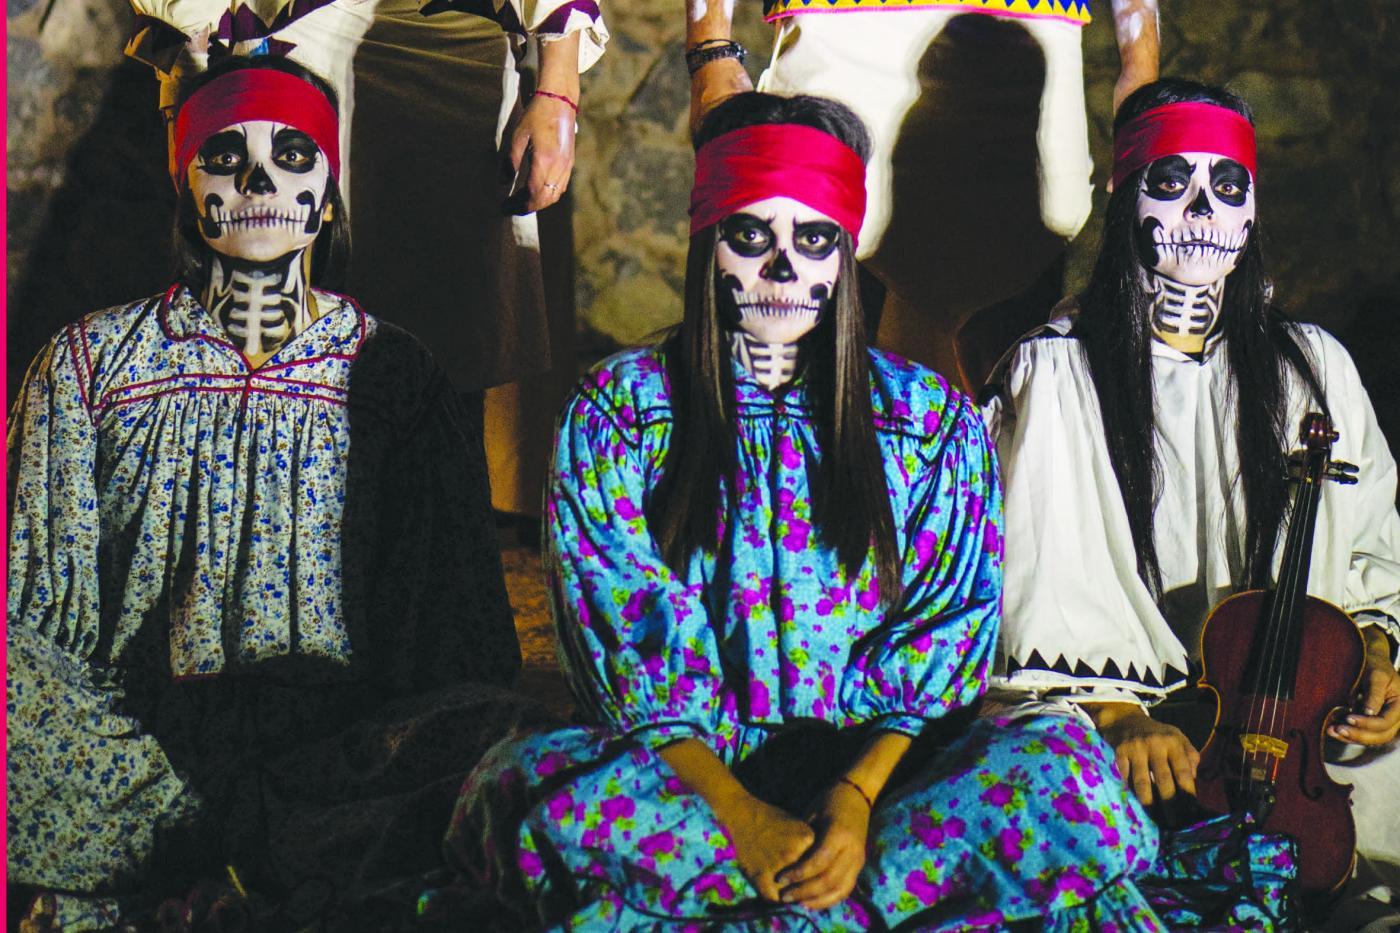 La Fiesta de Muertos mexicana vuelve al Otoño Cultural Iberoamericano